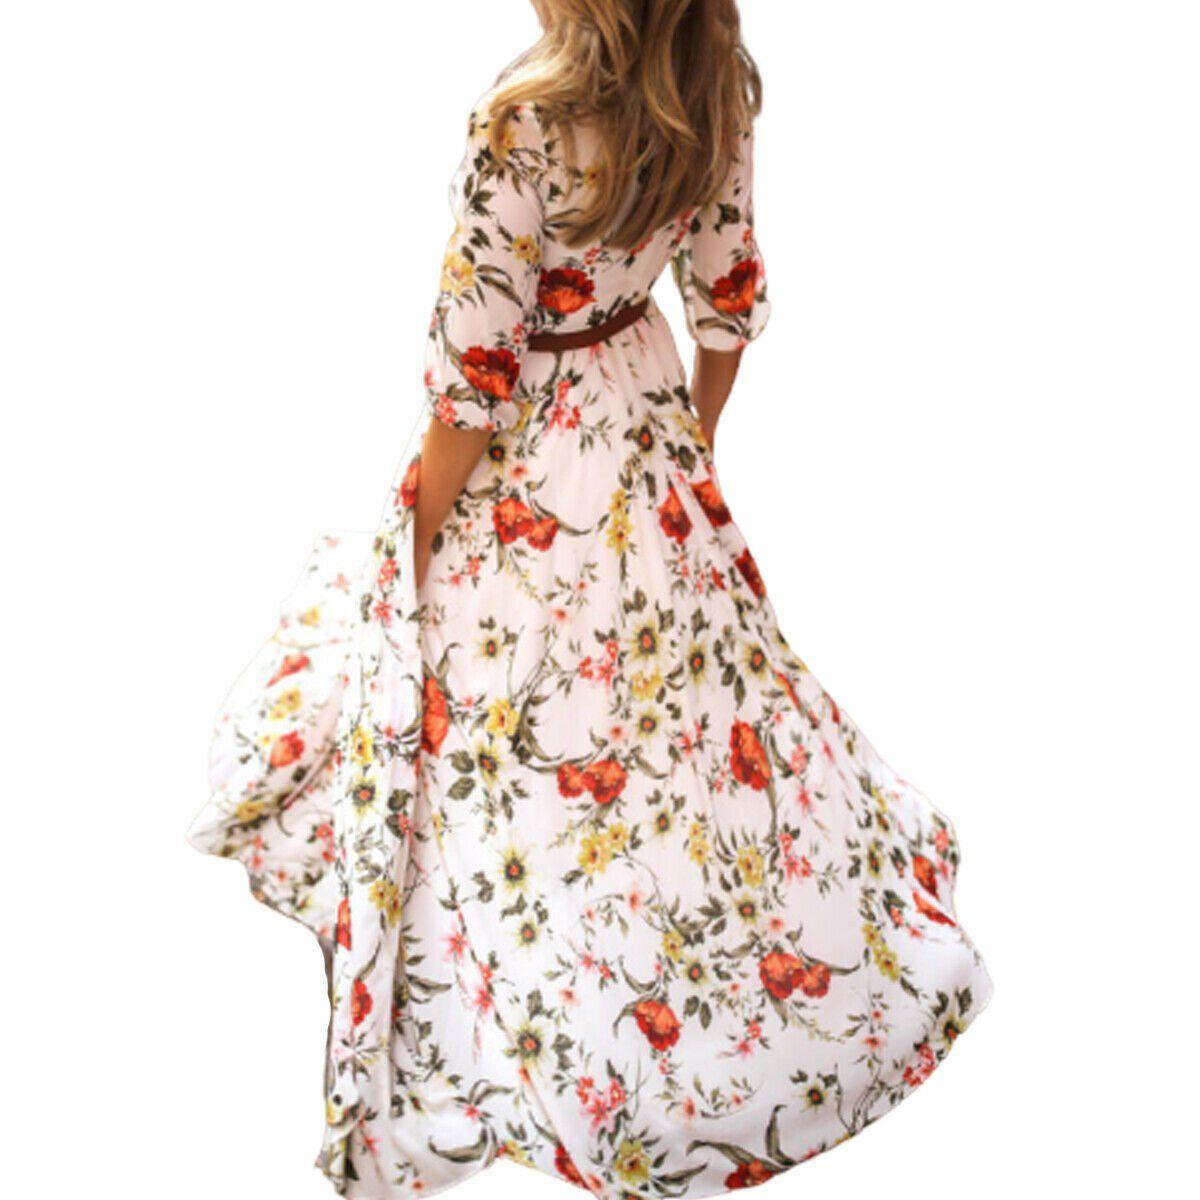 Opperiaya Women Vintage Floral Long Casual Long Sleeve Maxi Dress Walmart Com In 2021 Long Sleeve Maxi Dress Maxi Dress With Sleeves Maxi Dress [ 1200 x 1200 Pixel ]